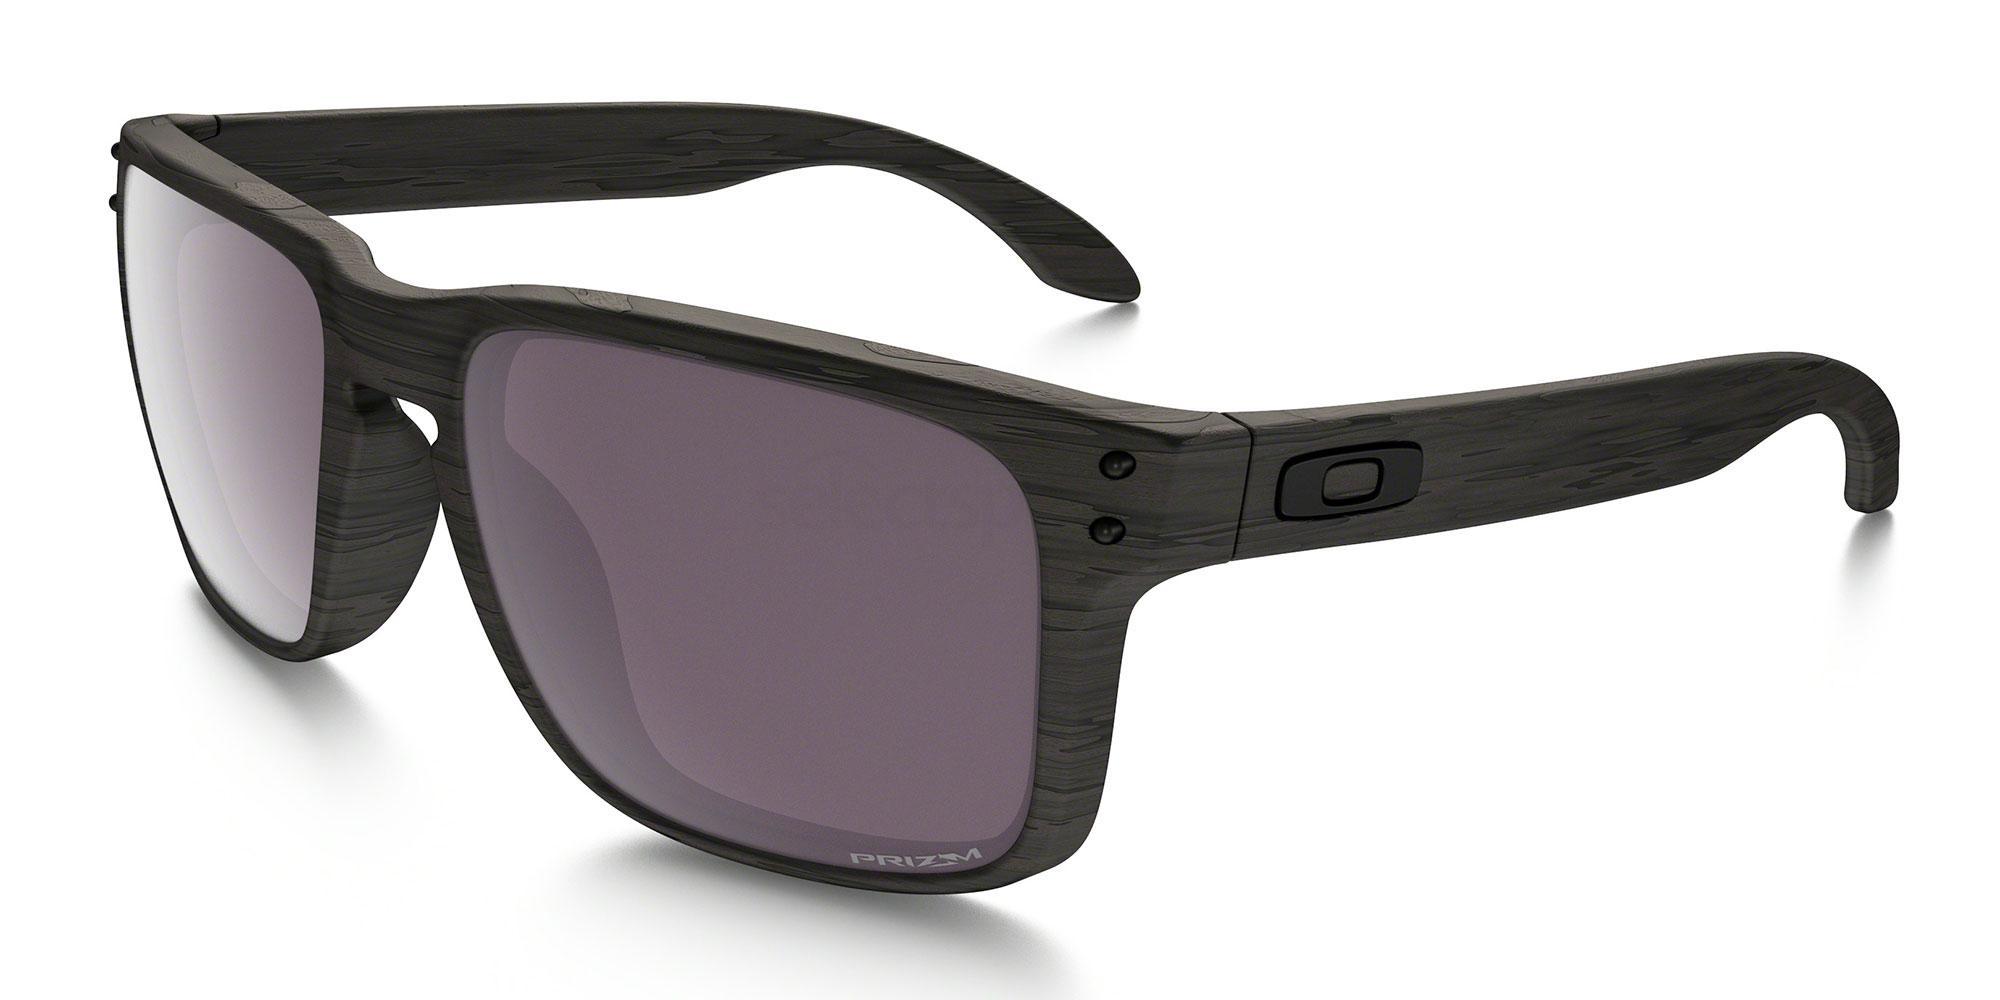 9102B7 OO9102 HOLBROOK (Polarized) Sunglasses, Oakley